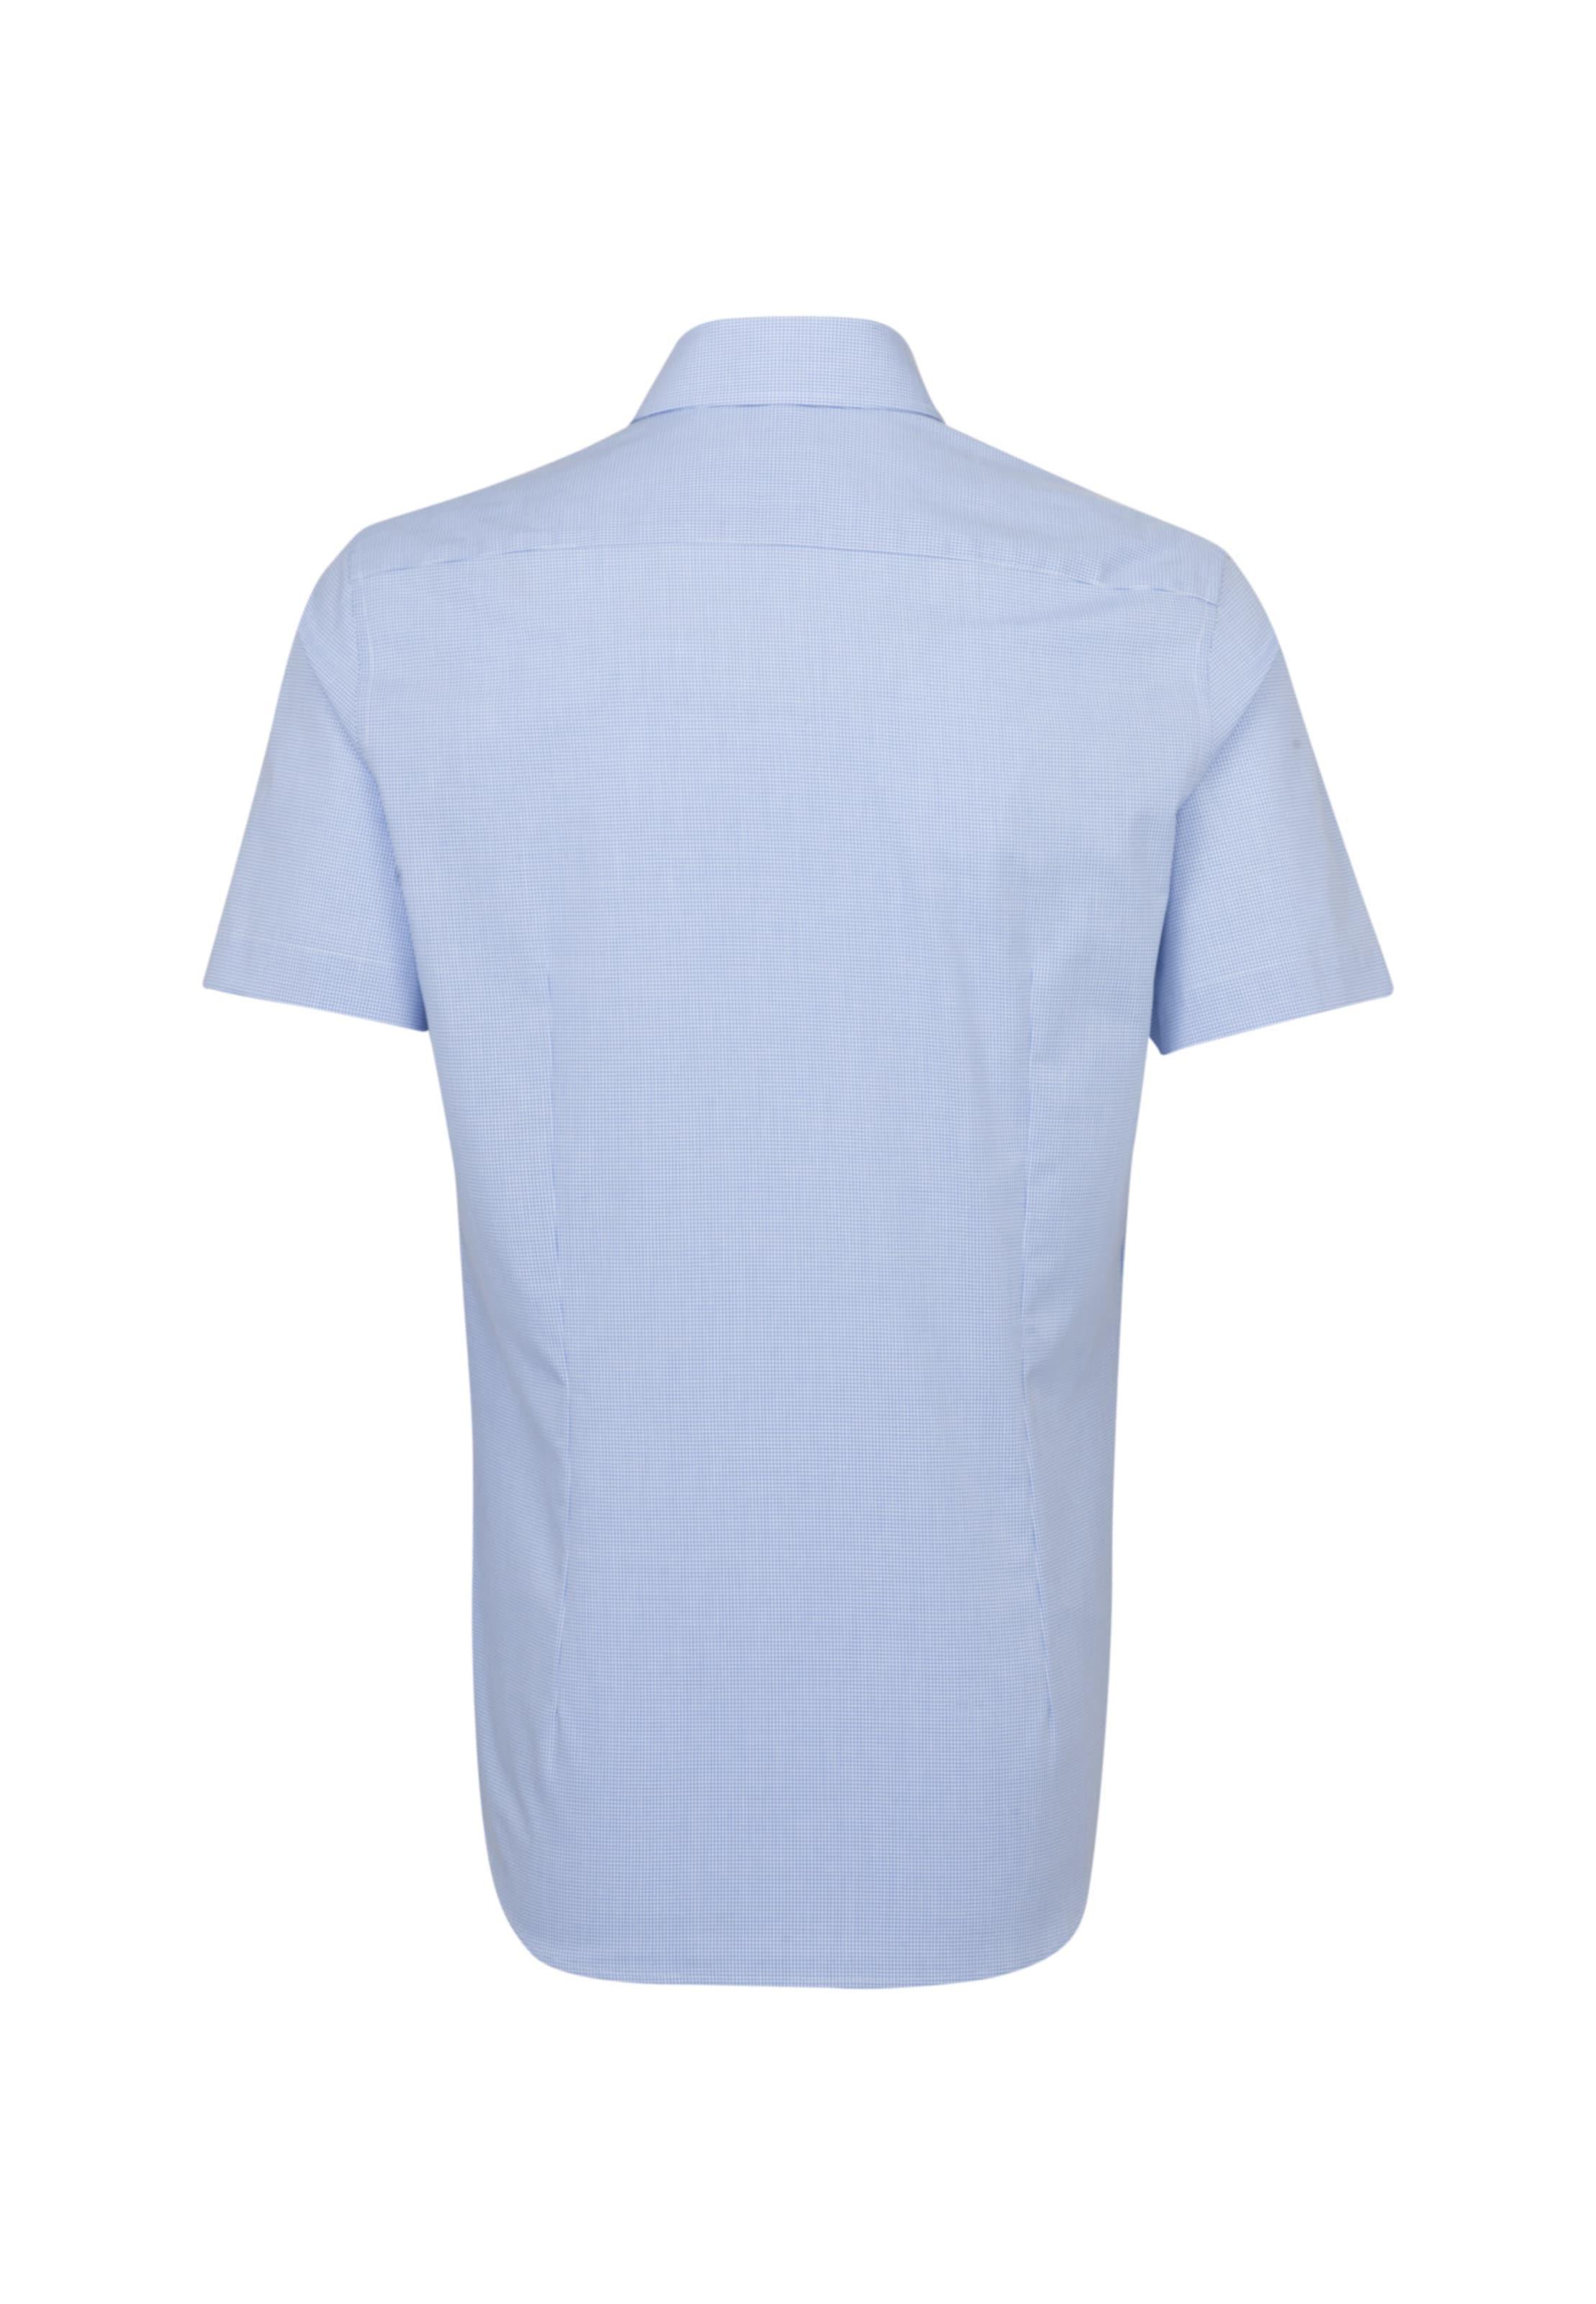 SEIDENSTICKER Business Hemd ' Shaped ' in blau Kariert 01.293759-0013-38